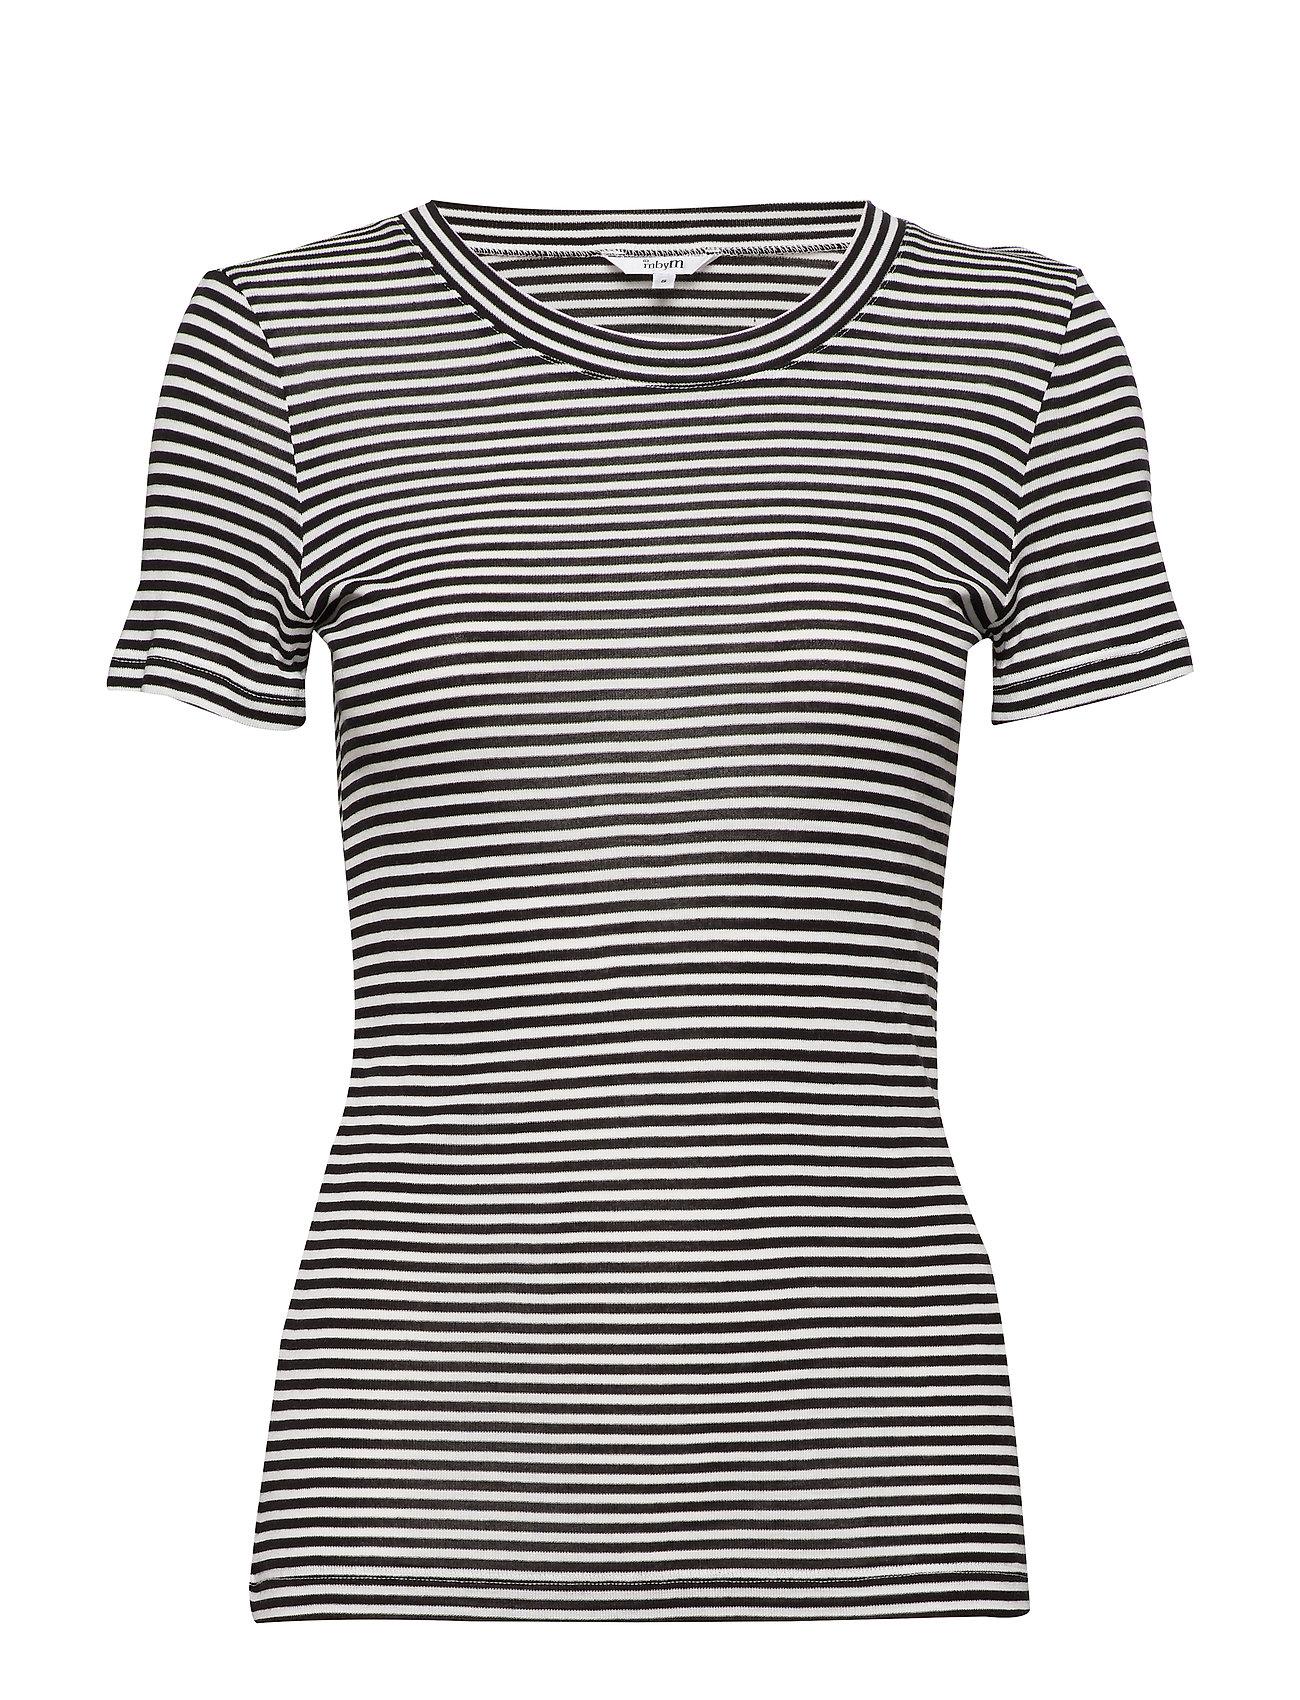 72fa92809953 Samira stríput mbyM basic t-shirt – Shopping.fo